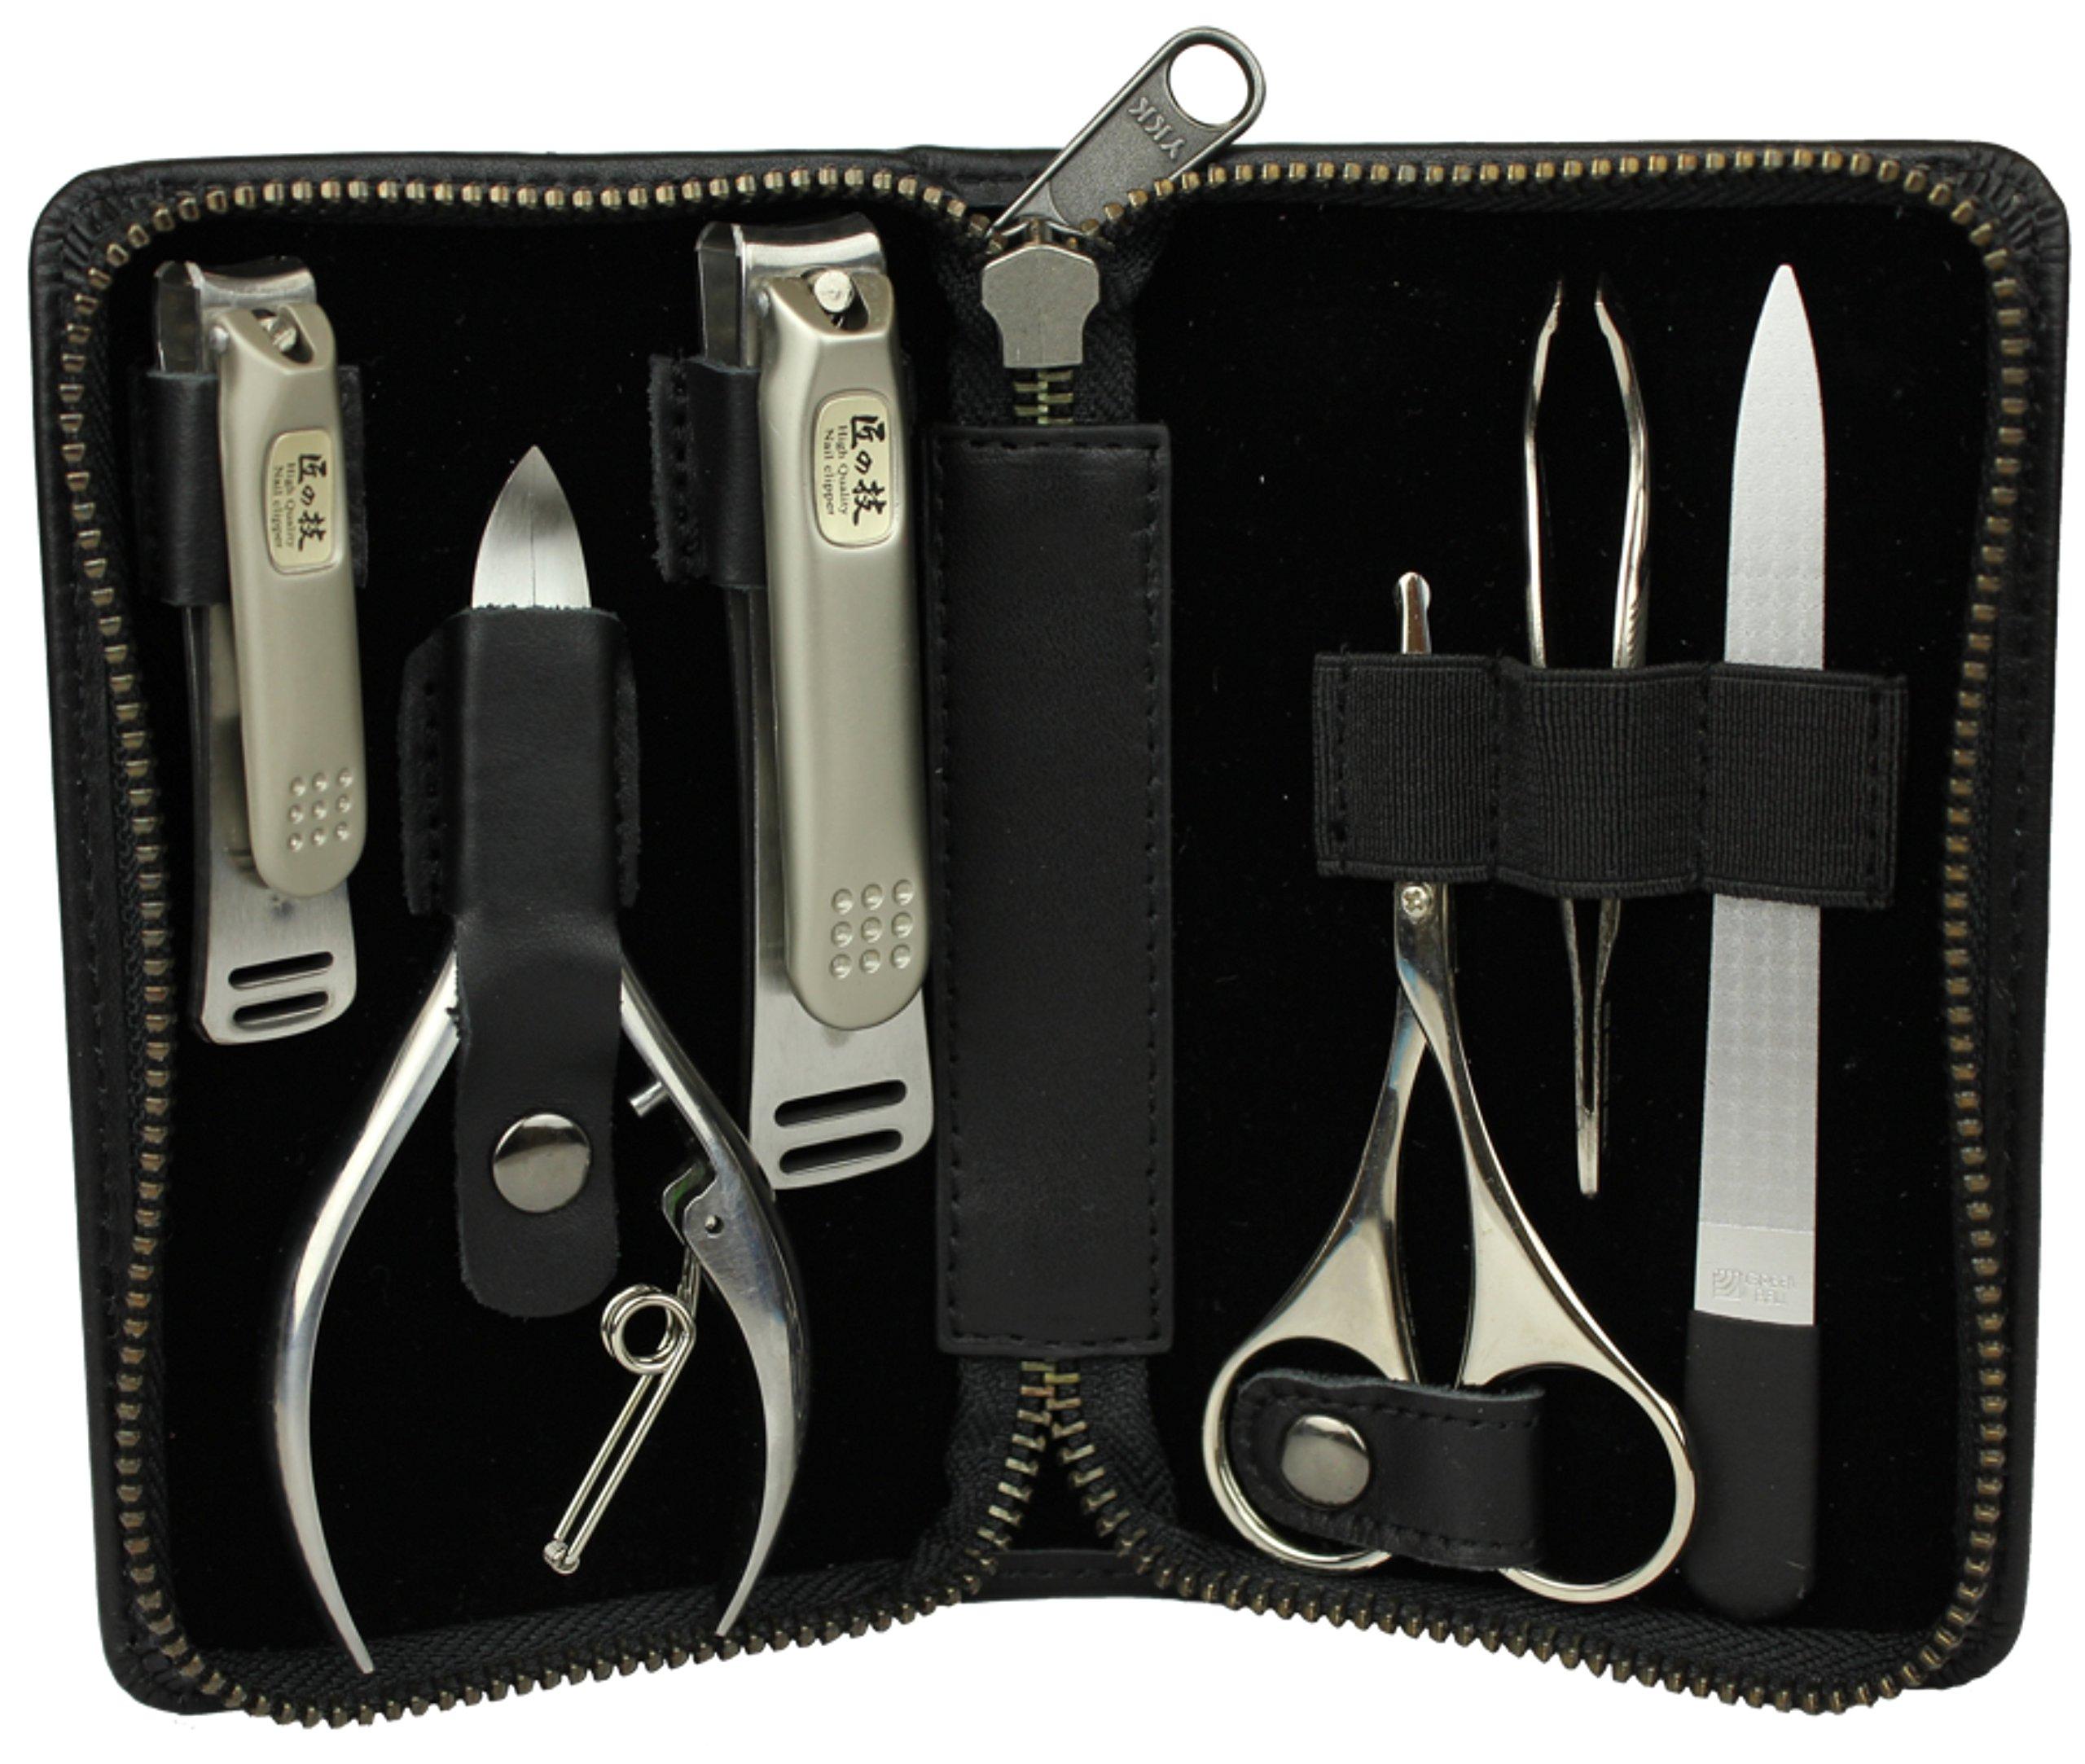 Takumi No Waza G-3103 - Craftsman Luxury 6-Piece Grooming Kit